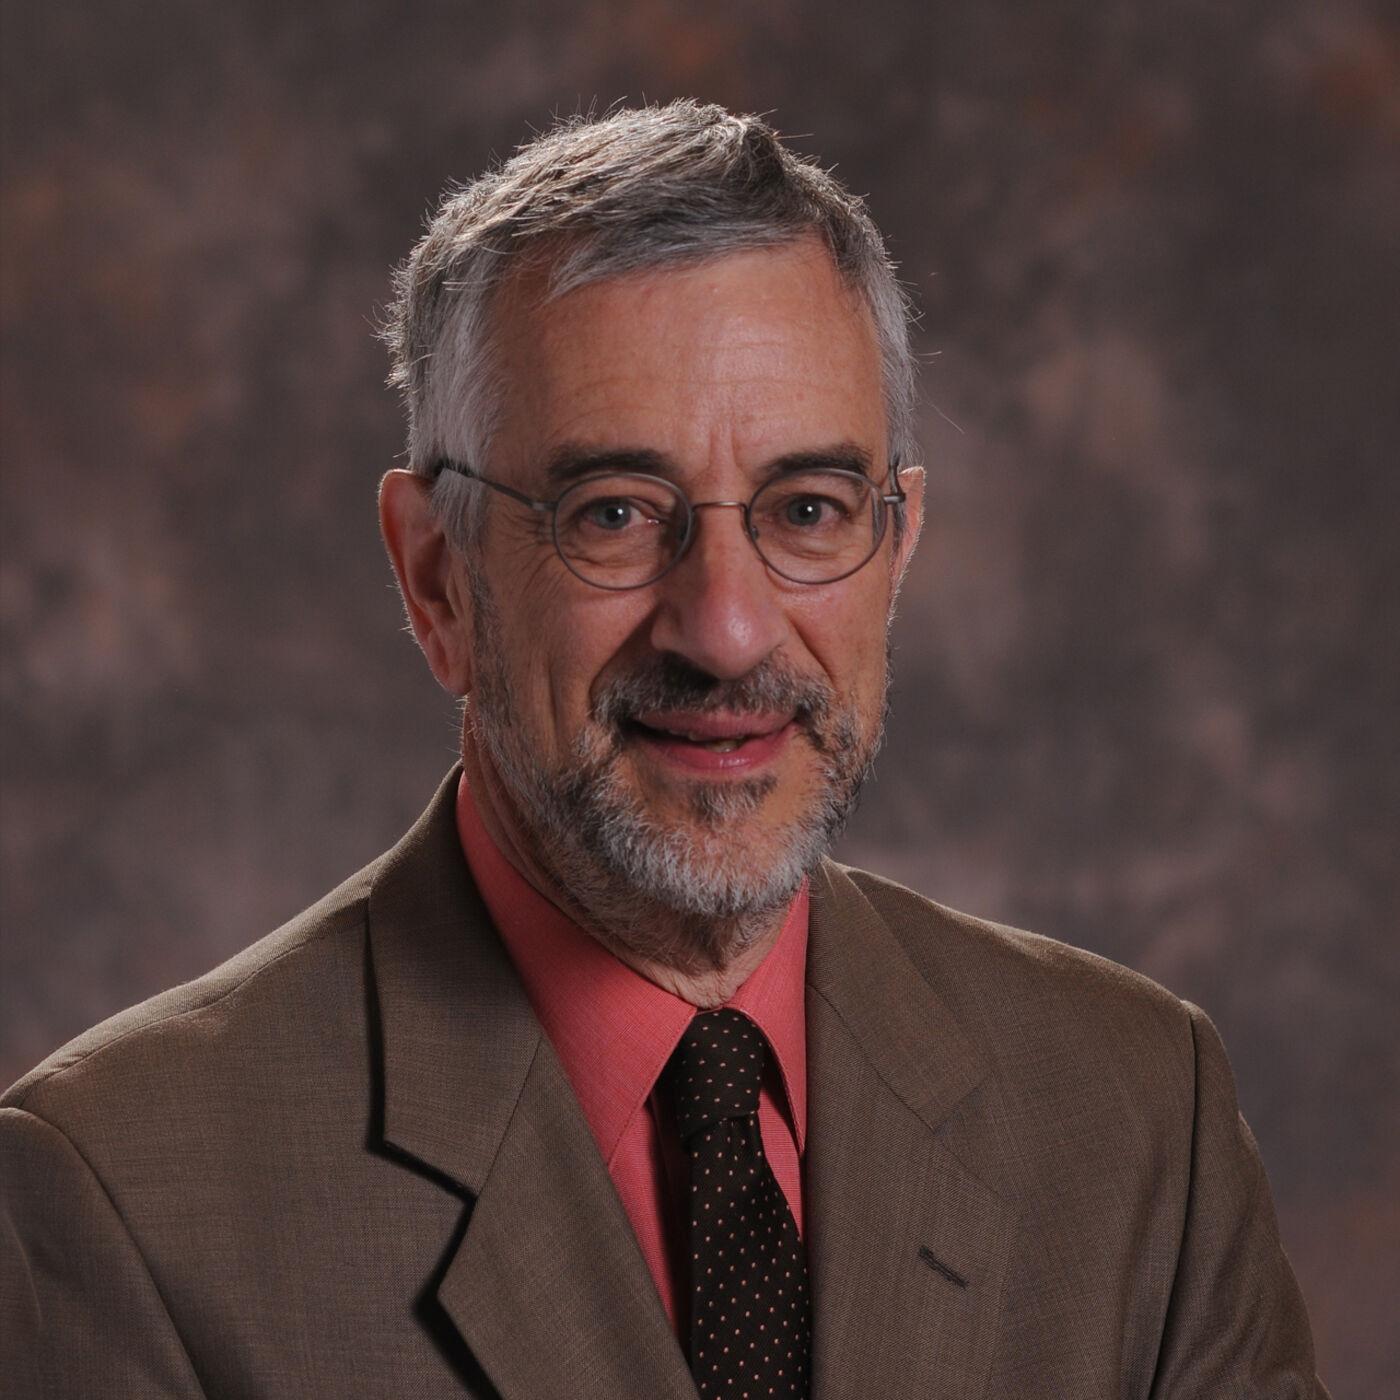 #22 - AGC Chief Economist, Ken Simonson